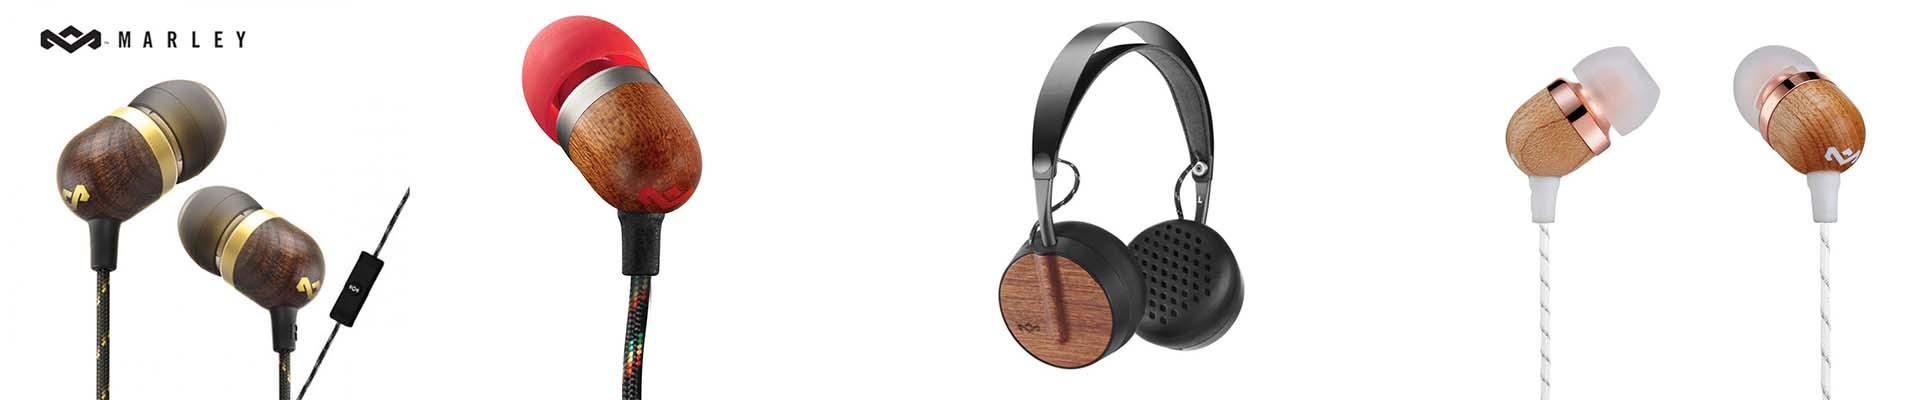 Marley-in ear-Kopfhörer